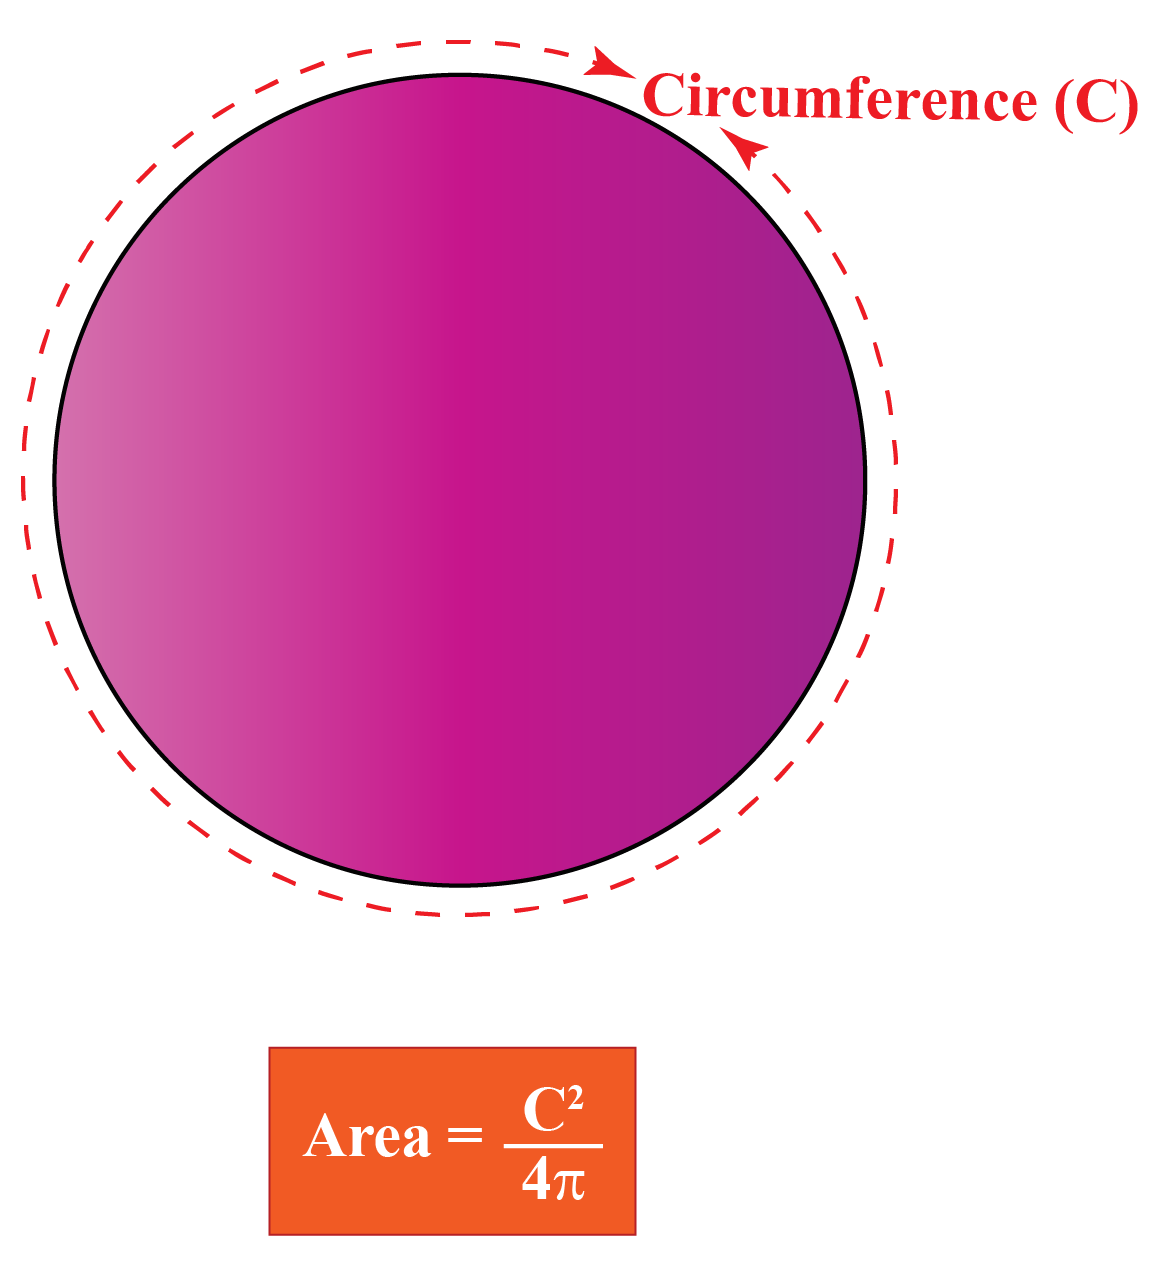 area of circle circumference